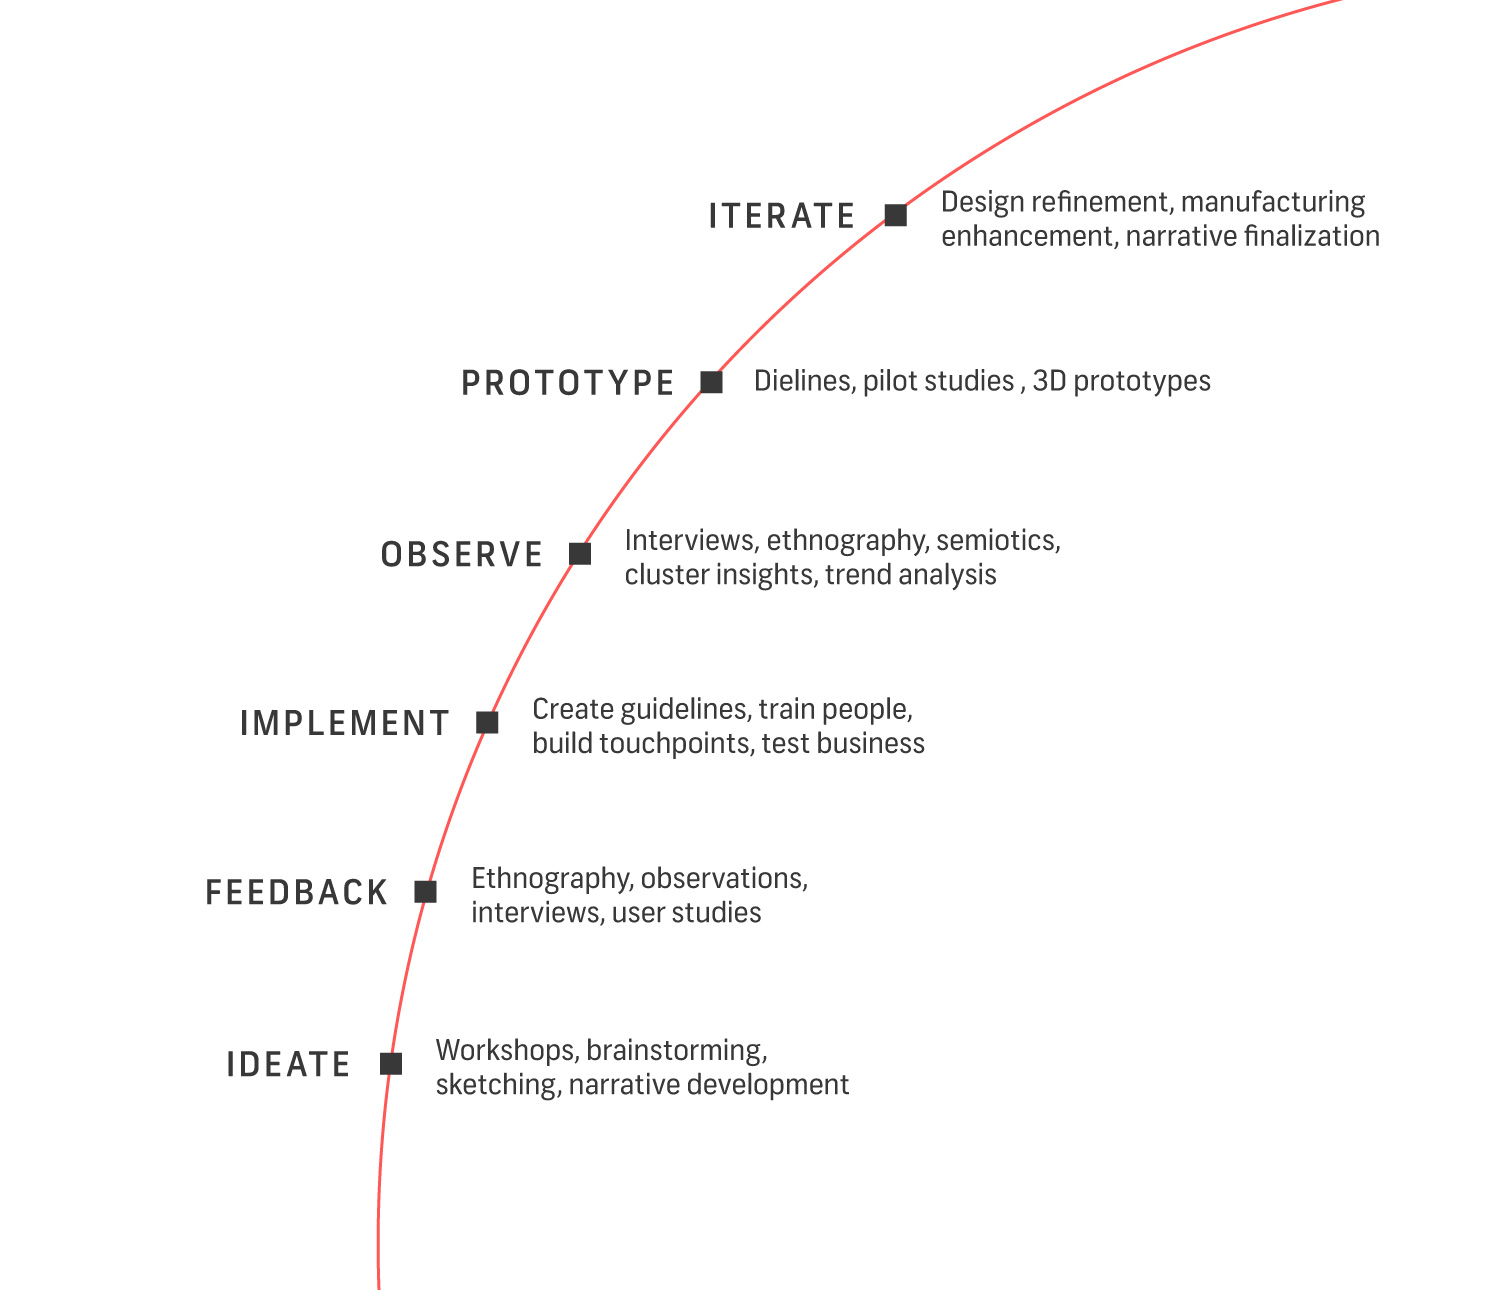 infographic-innovation.jpg